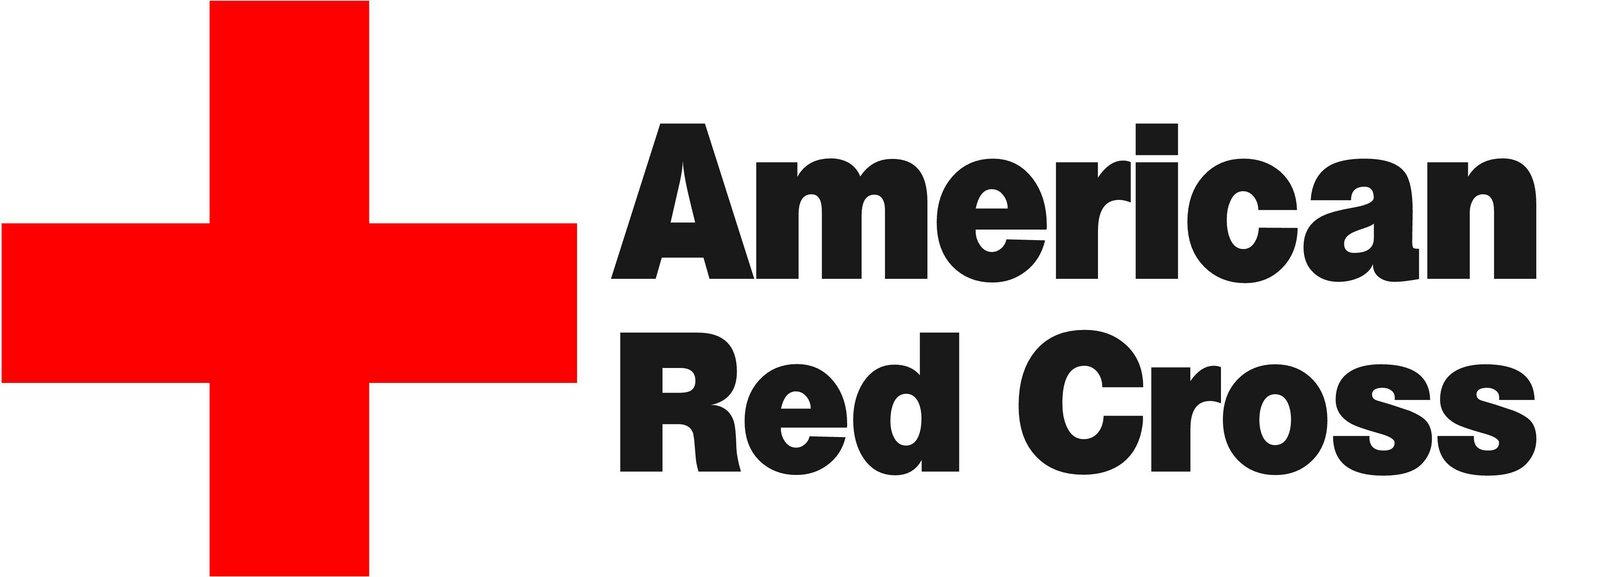 American_Red_Cross.jpg